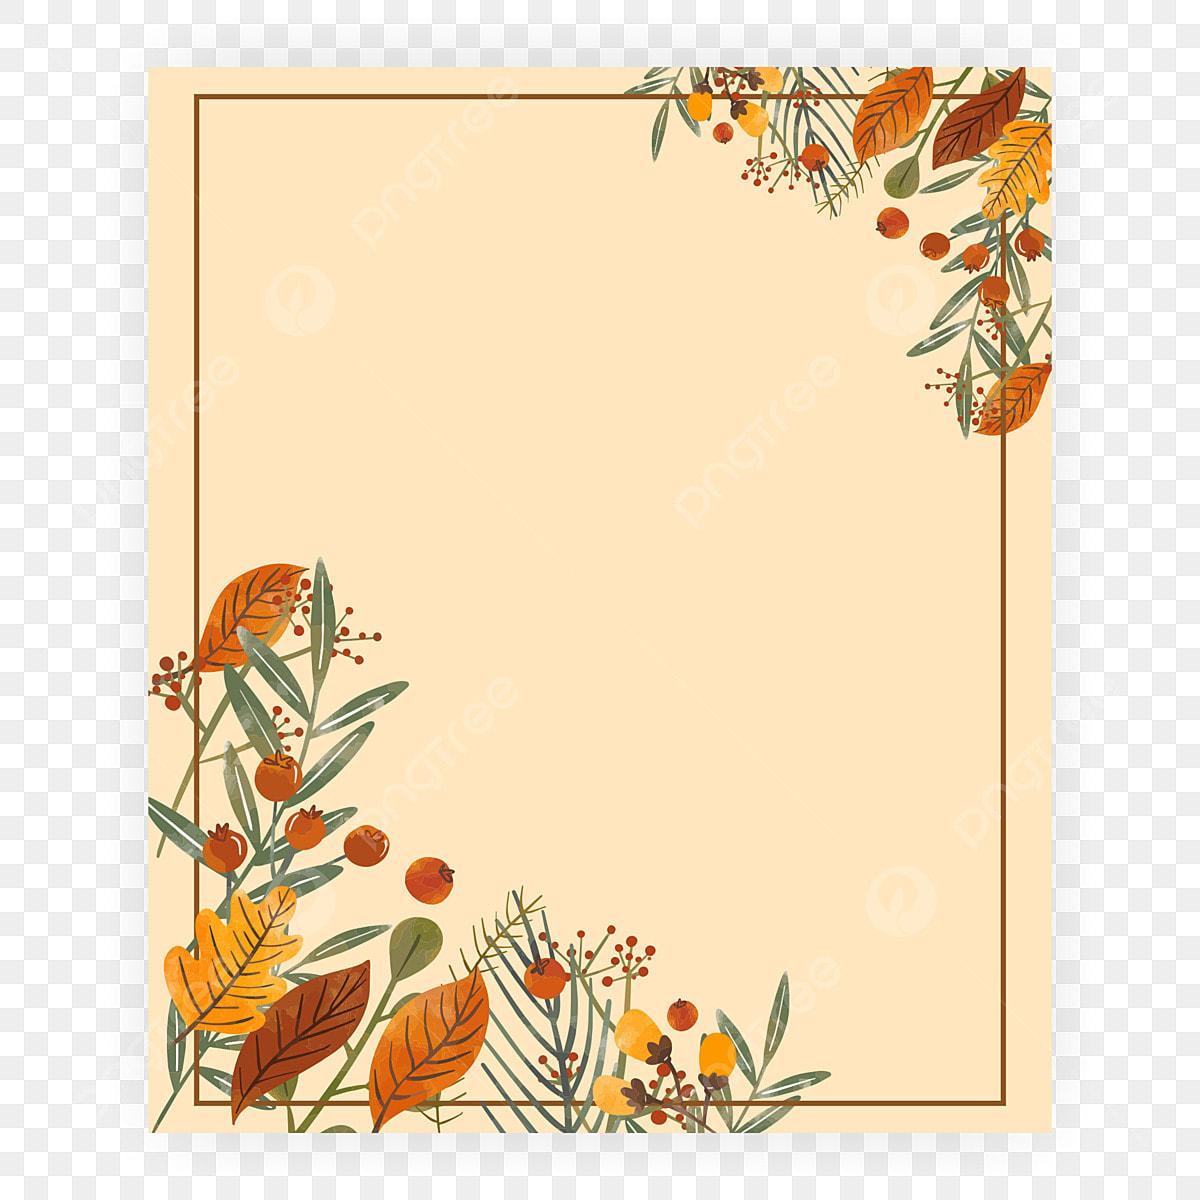 Autumn Flowers Frame For Wedding Invitation Card Frame